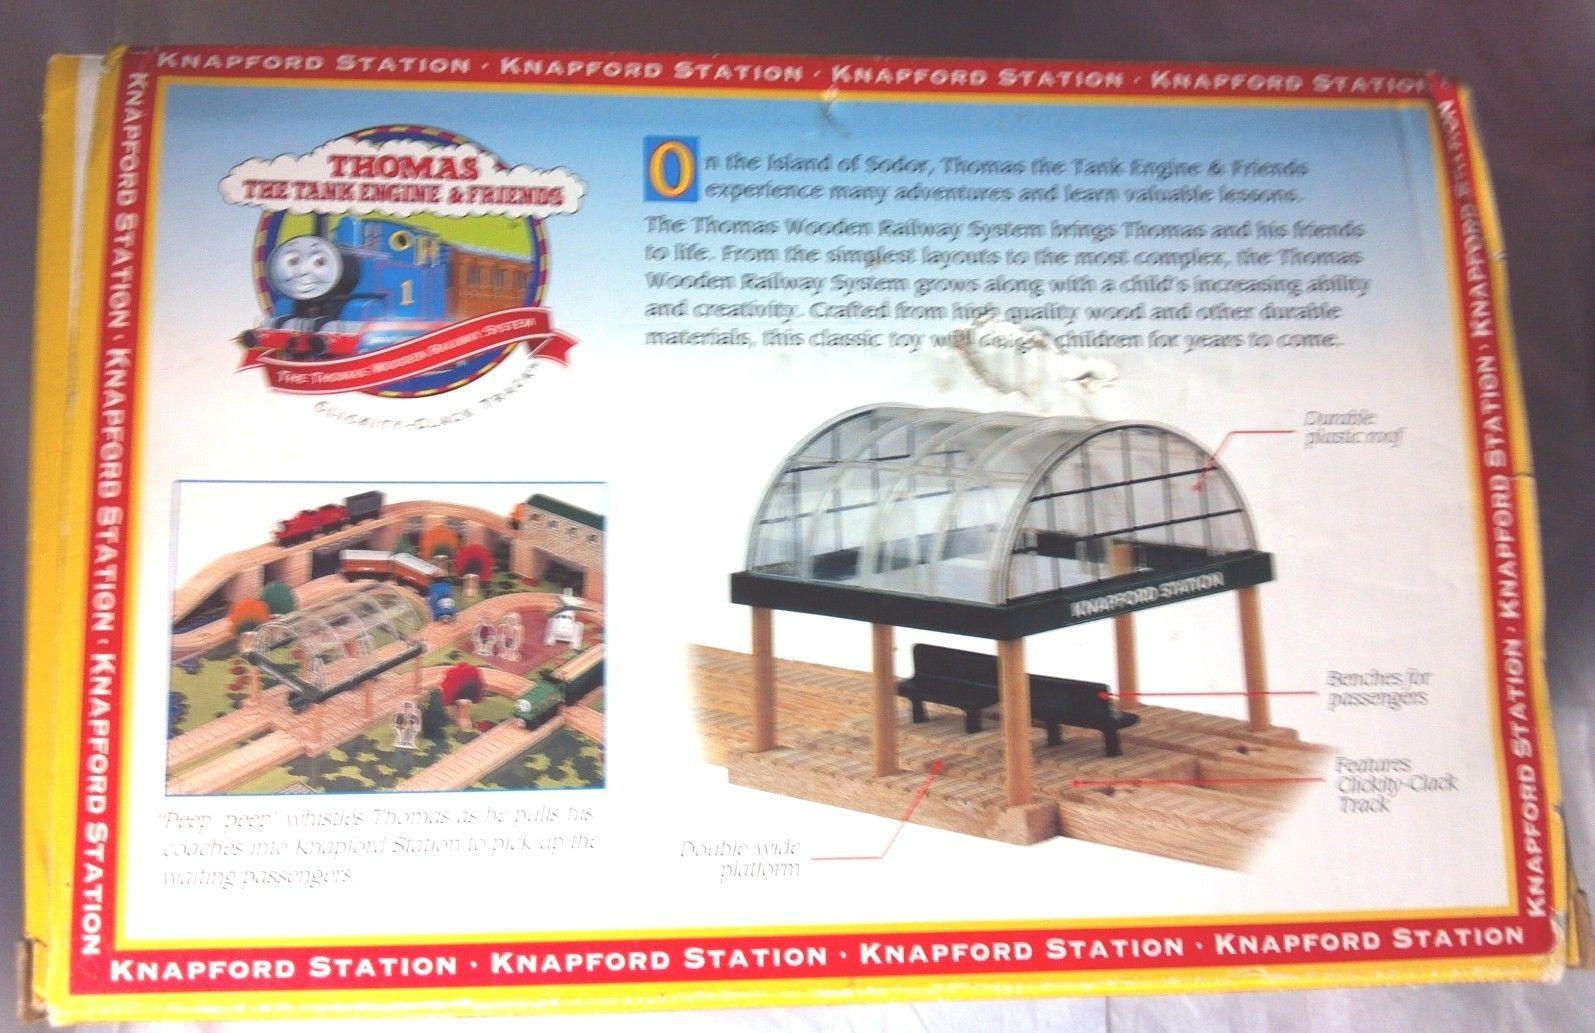 Knapford Station Platform Thomas Wooden Railway Wiki